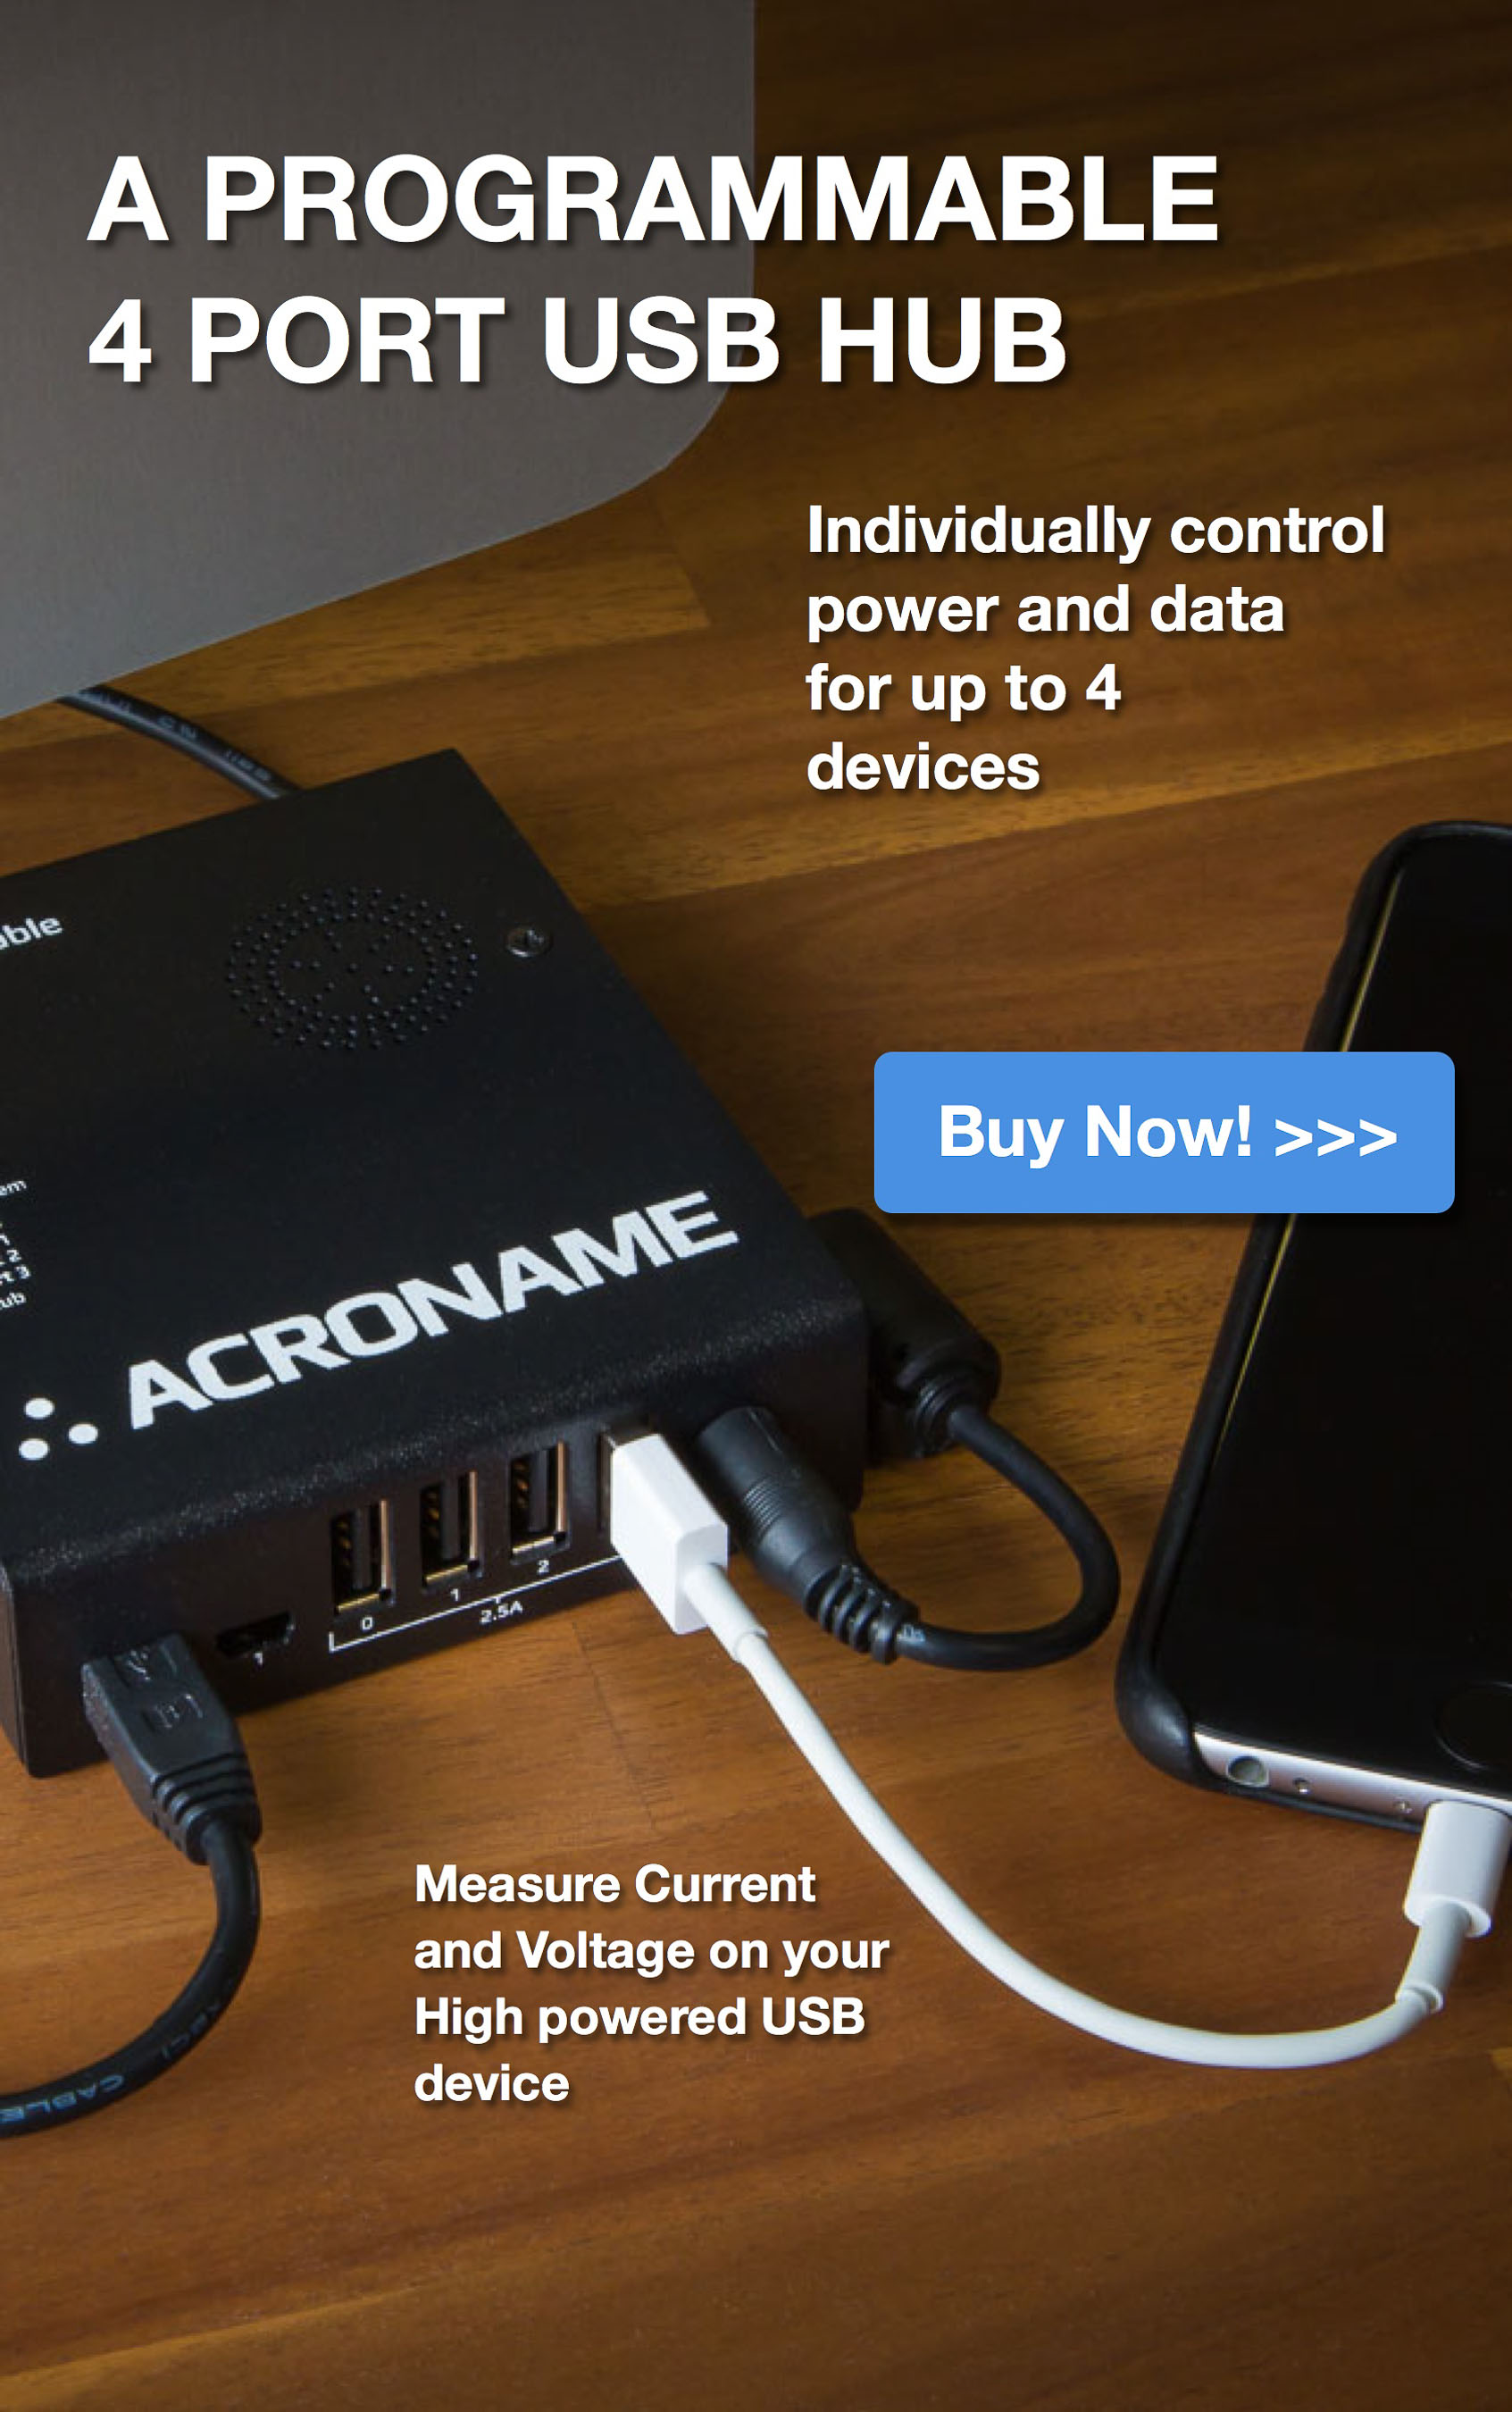 Acroname Programmable 4 port USB Hub